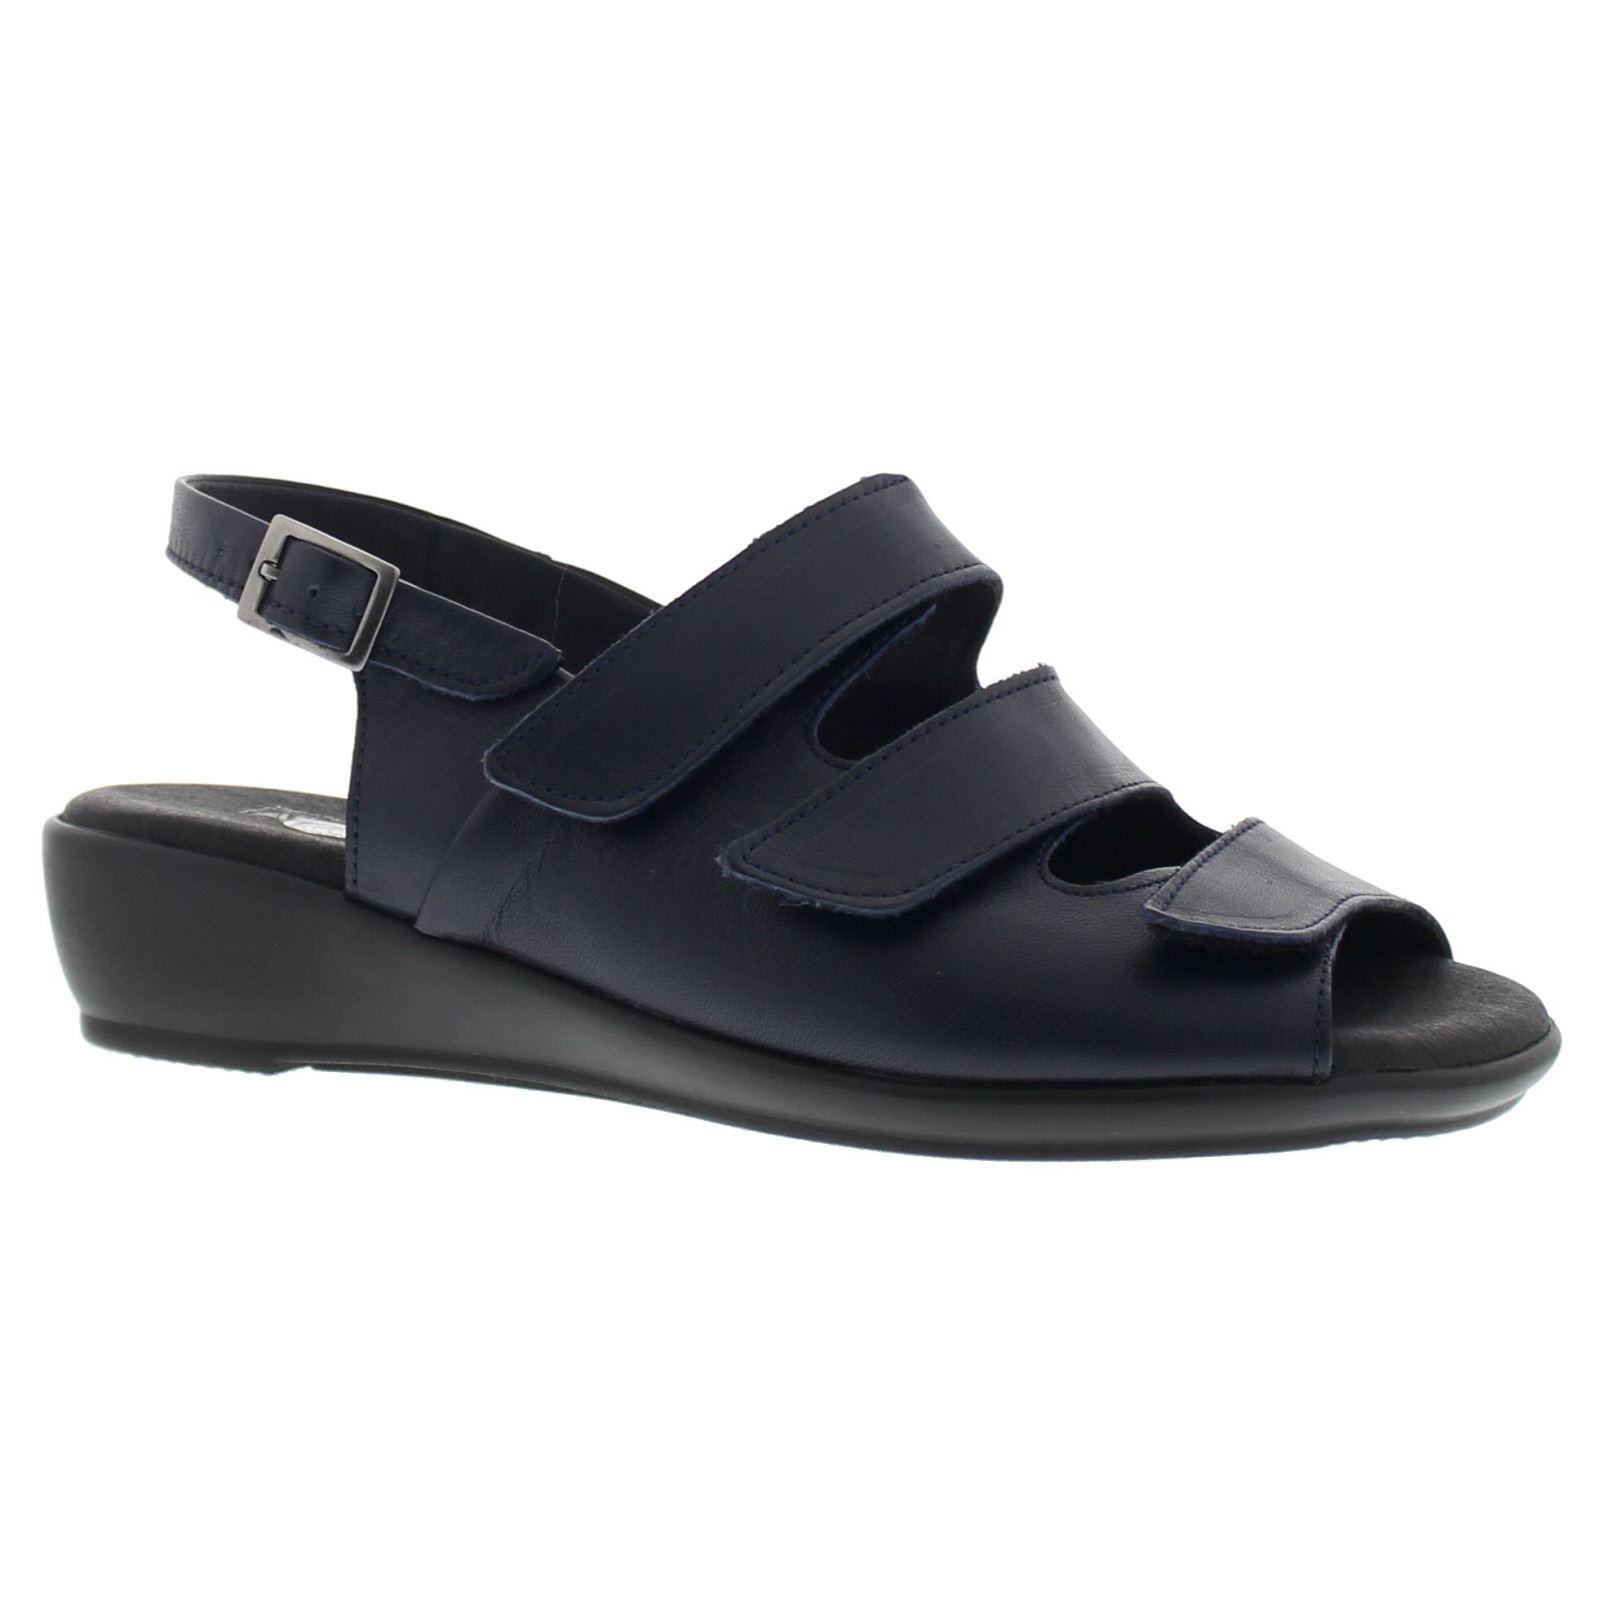 Arcopedico femmes Sandal 3 Navy Leather Sandals